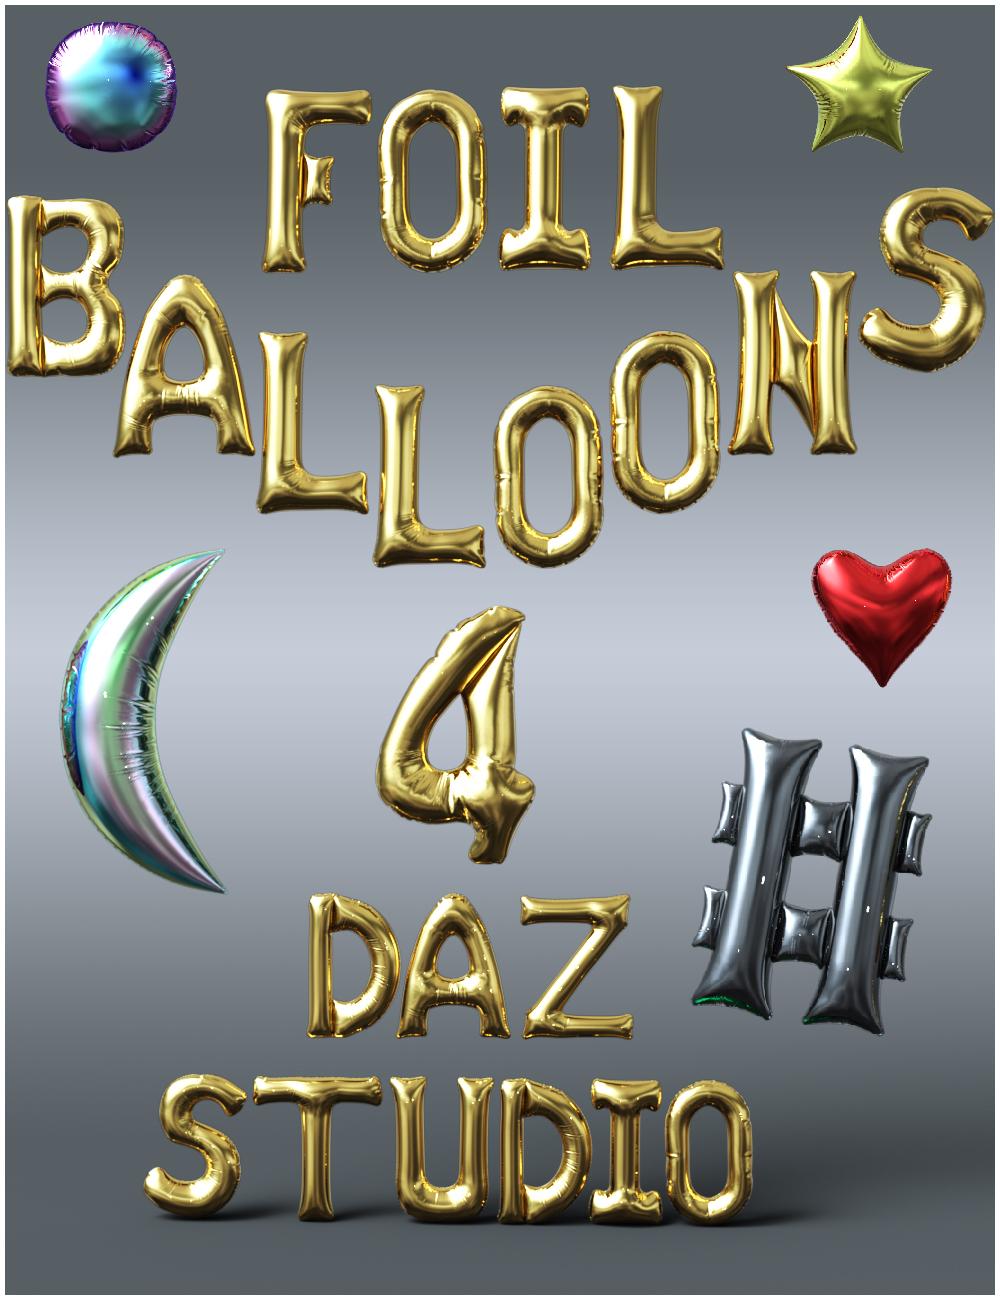 Foil Balloons Props by: Nikisatez, 3D Models by Daz 3D